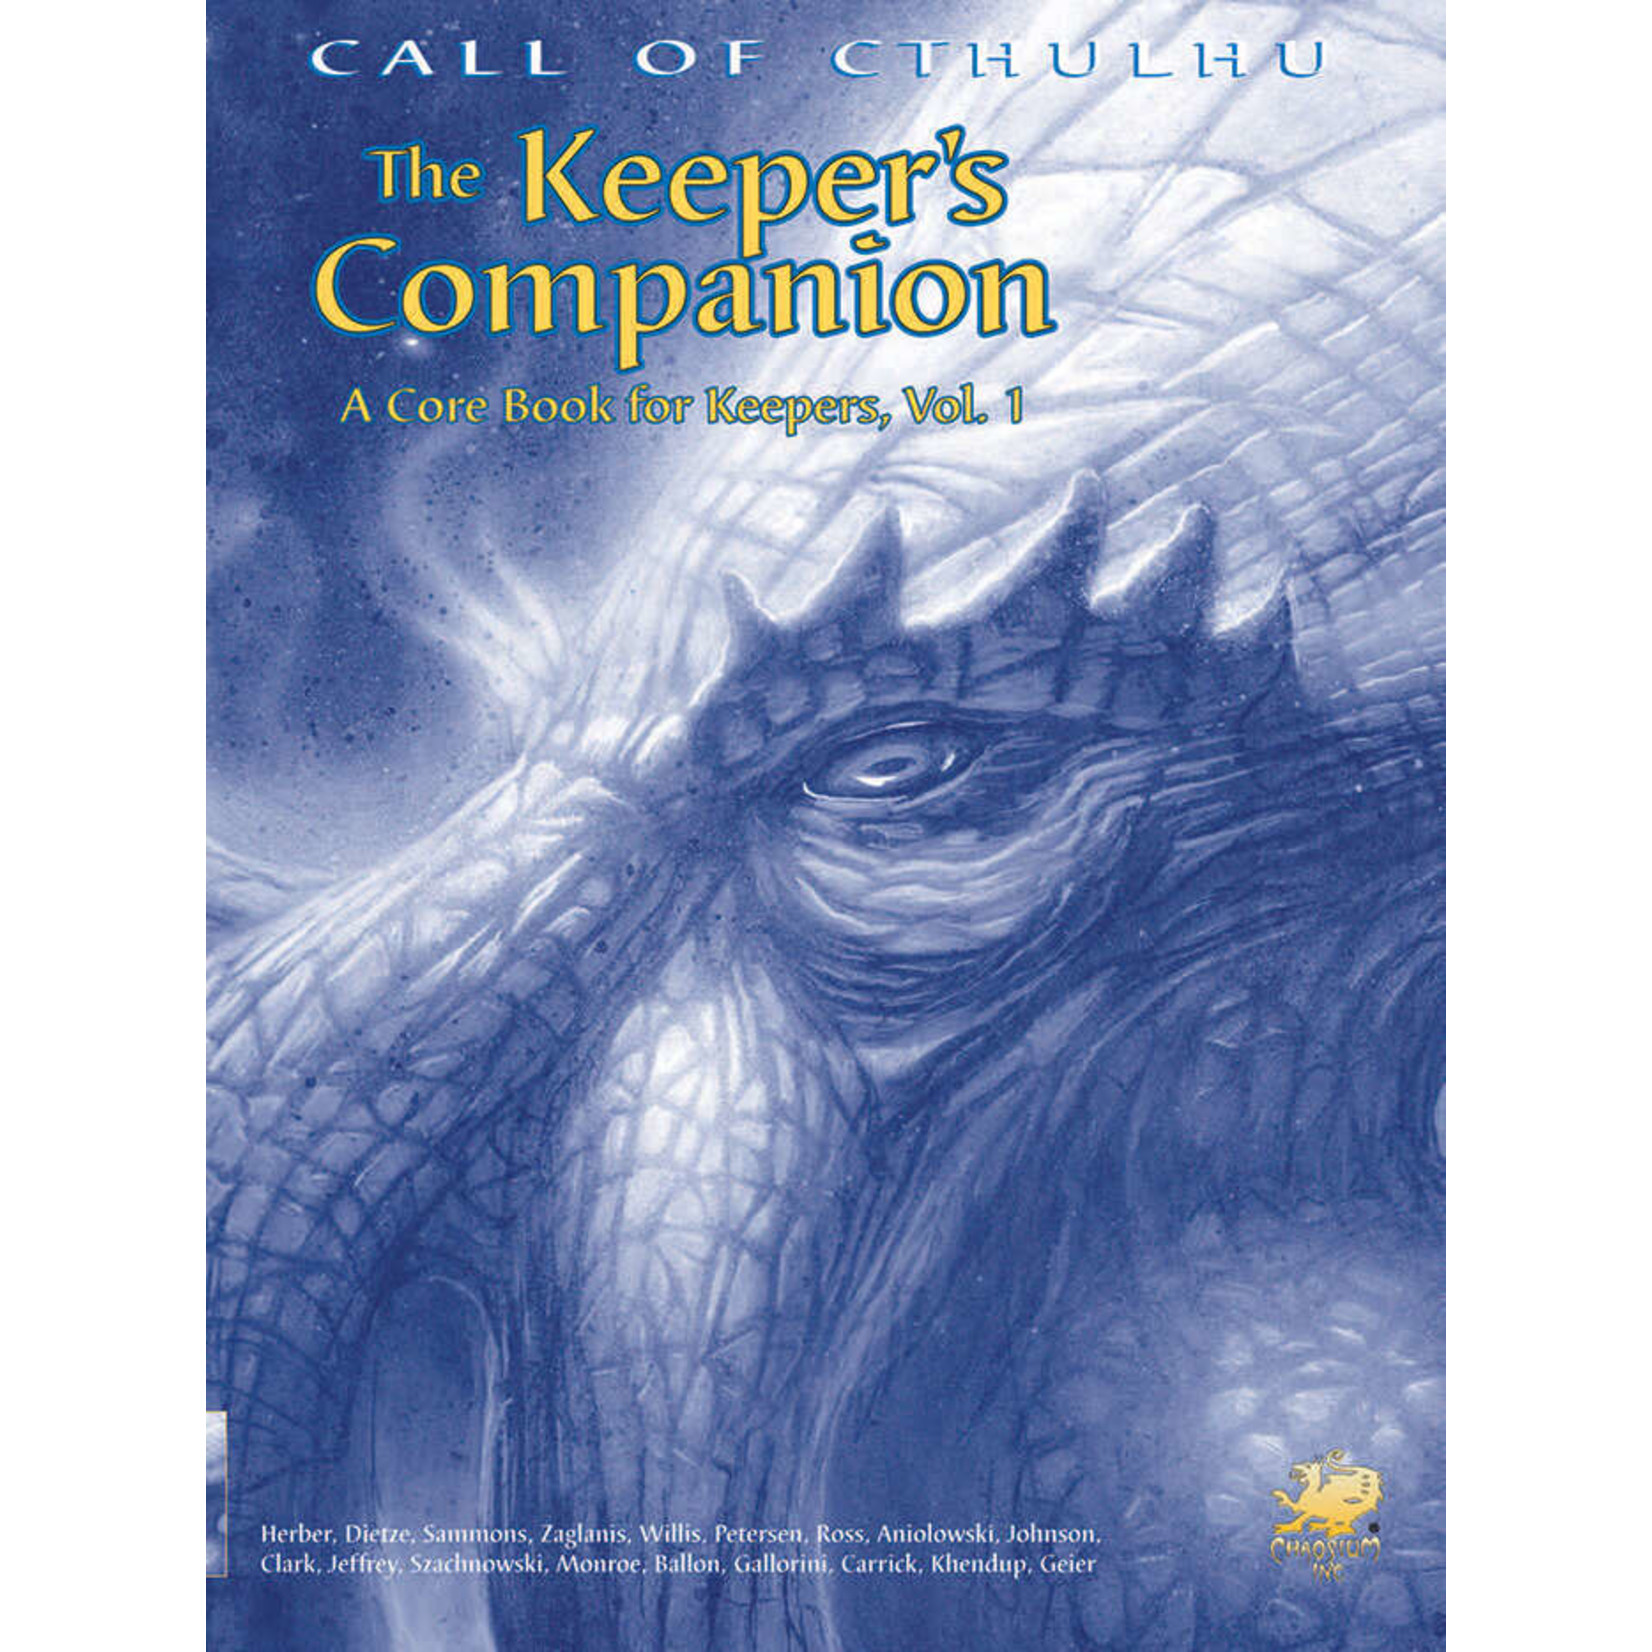 Call of Cthulhu RPG 6e The Keeper's Companion Vol. 1